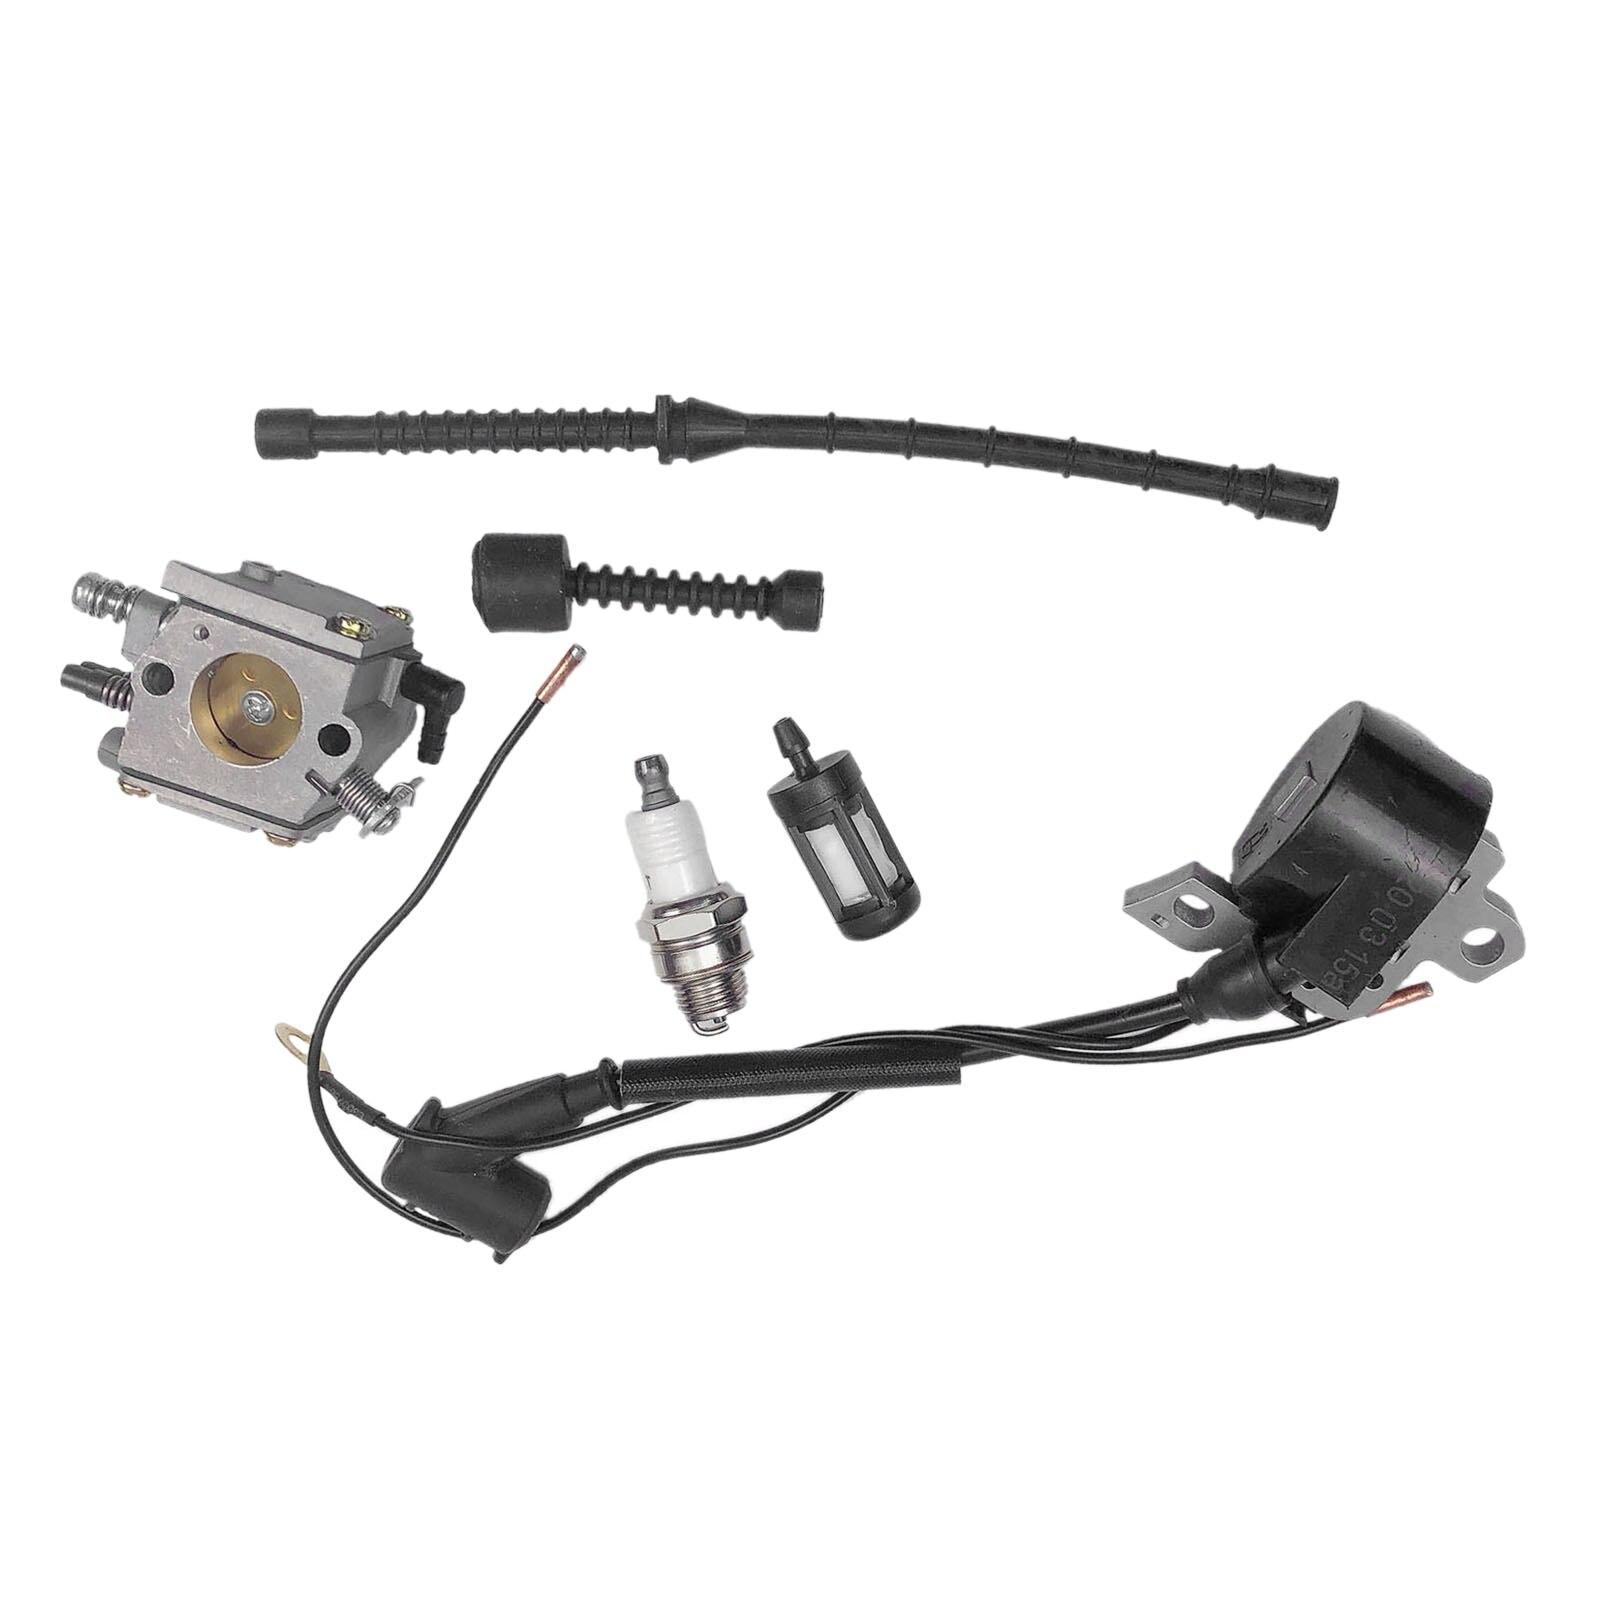 DRELD Carburetor Ignition Coil & Fuel Line/Filer Fit For STIHL Chain Saw/Chainsaws 038 MS380 MS381 038 AV SUPER MAGNUM